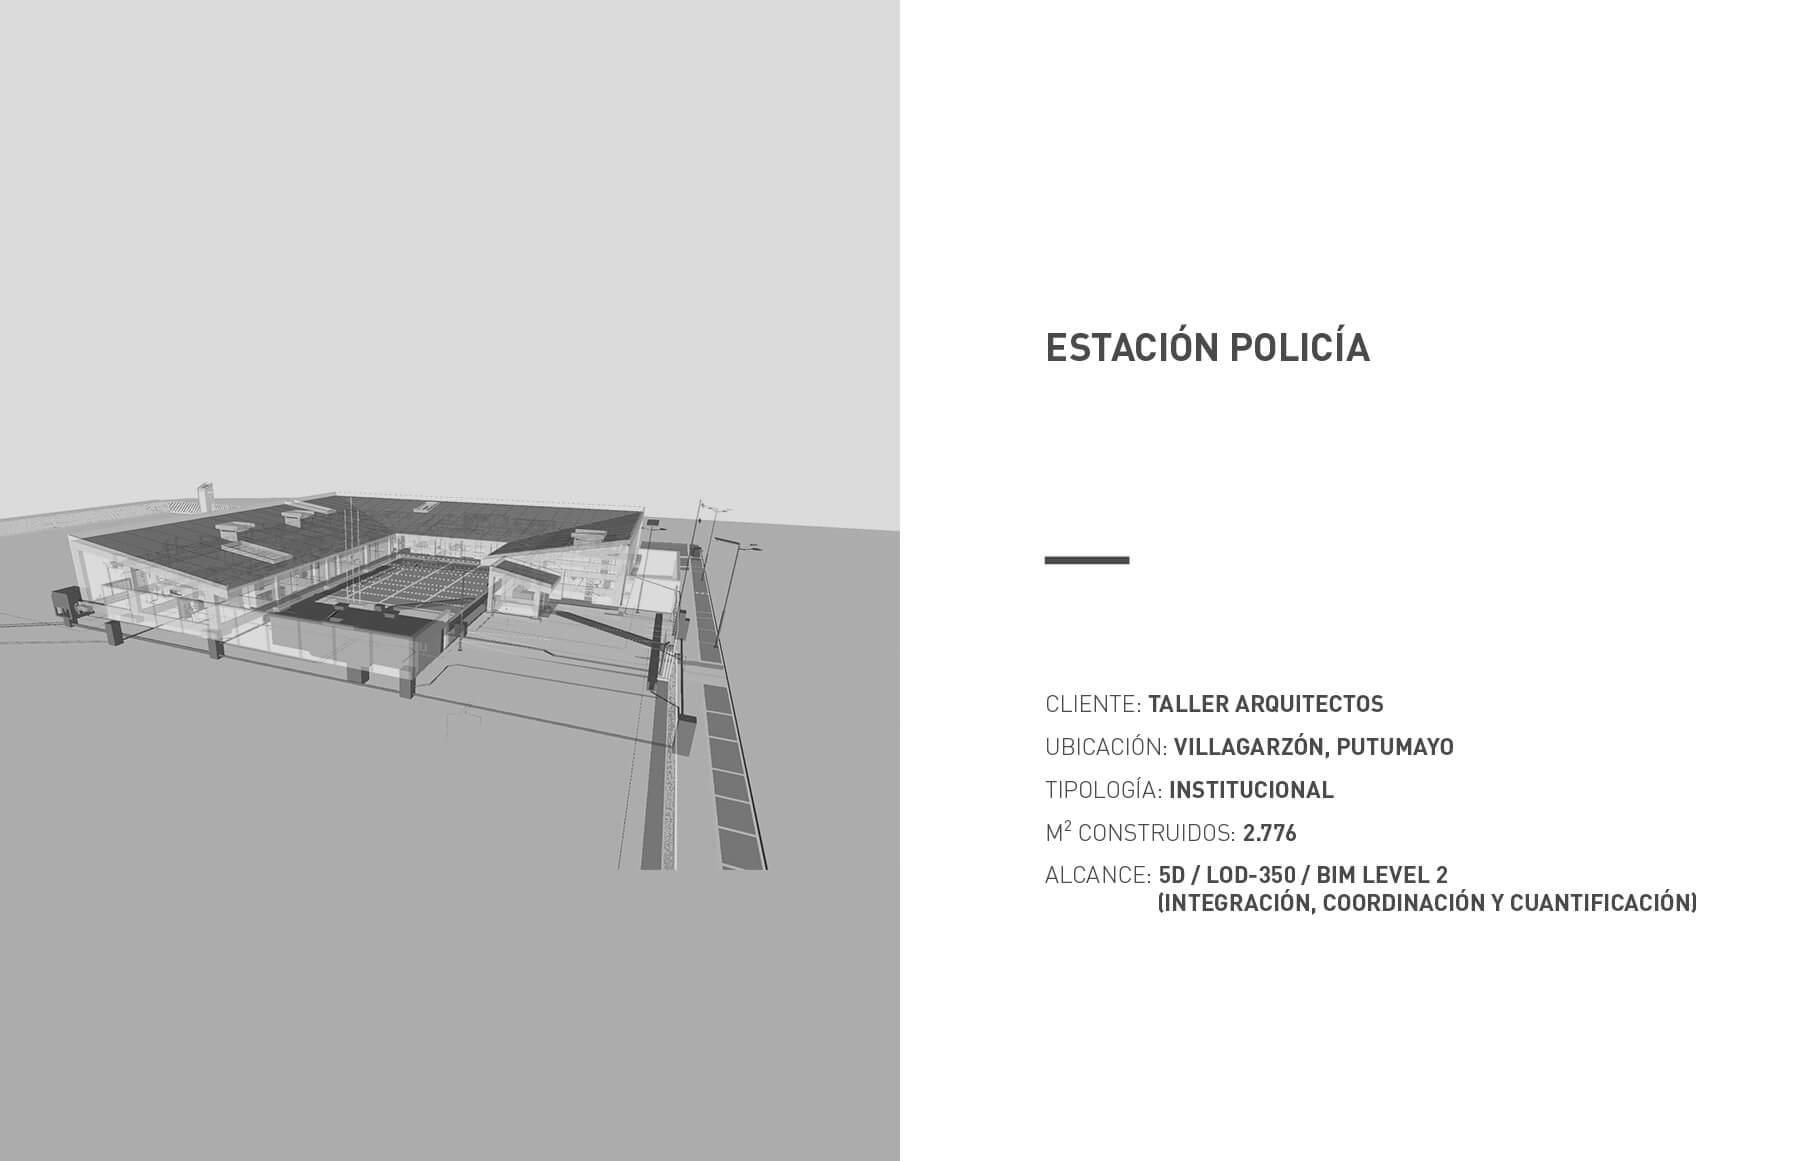 estación policía